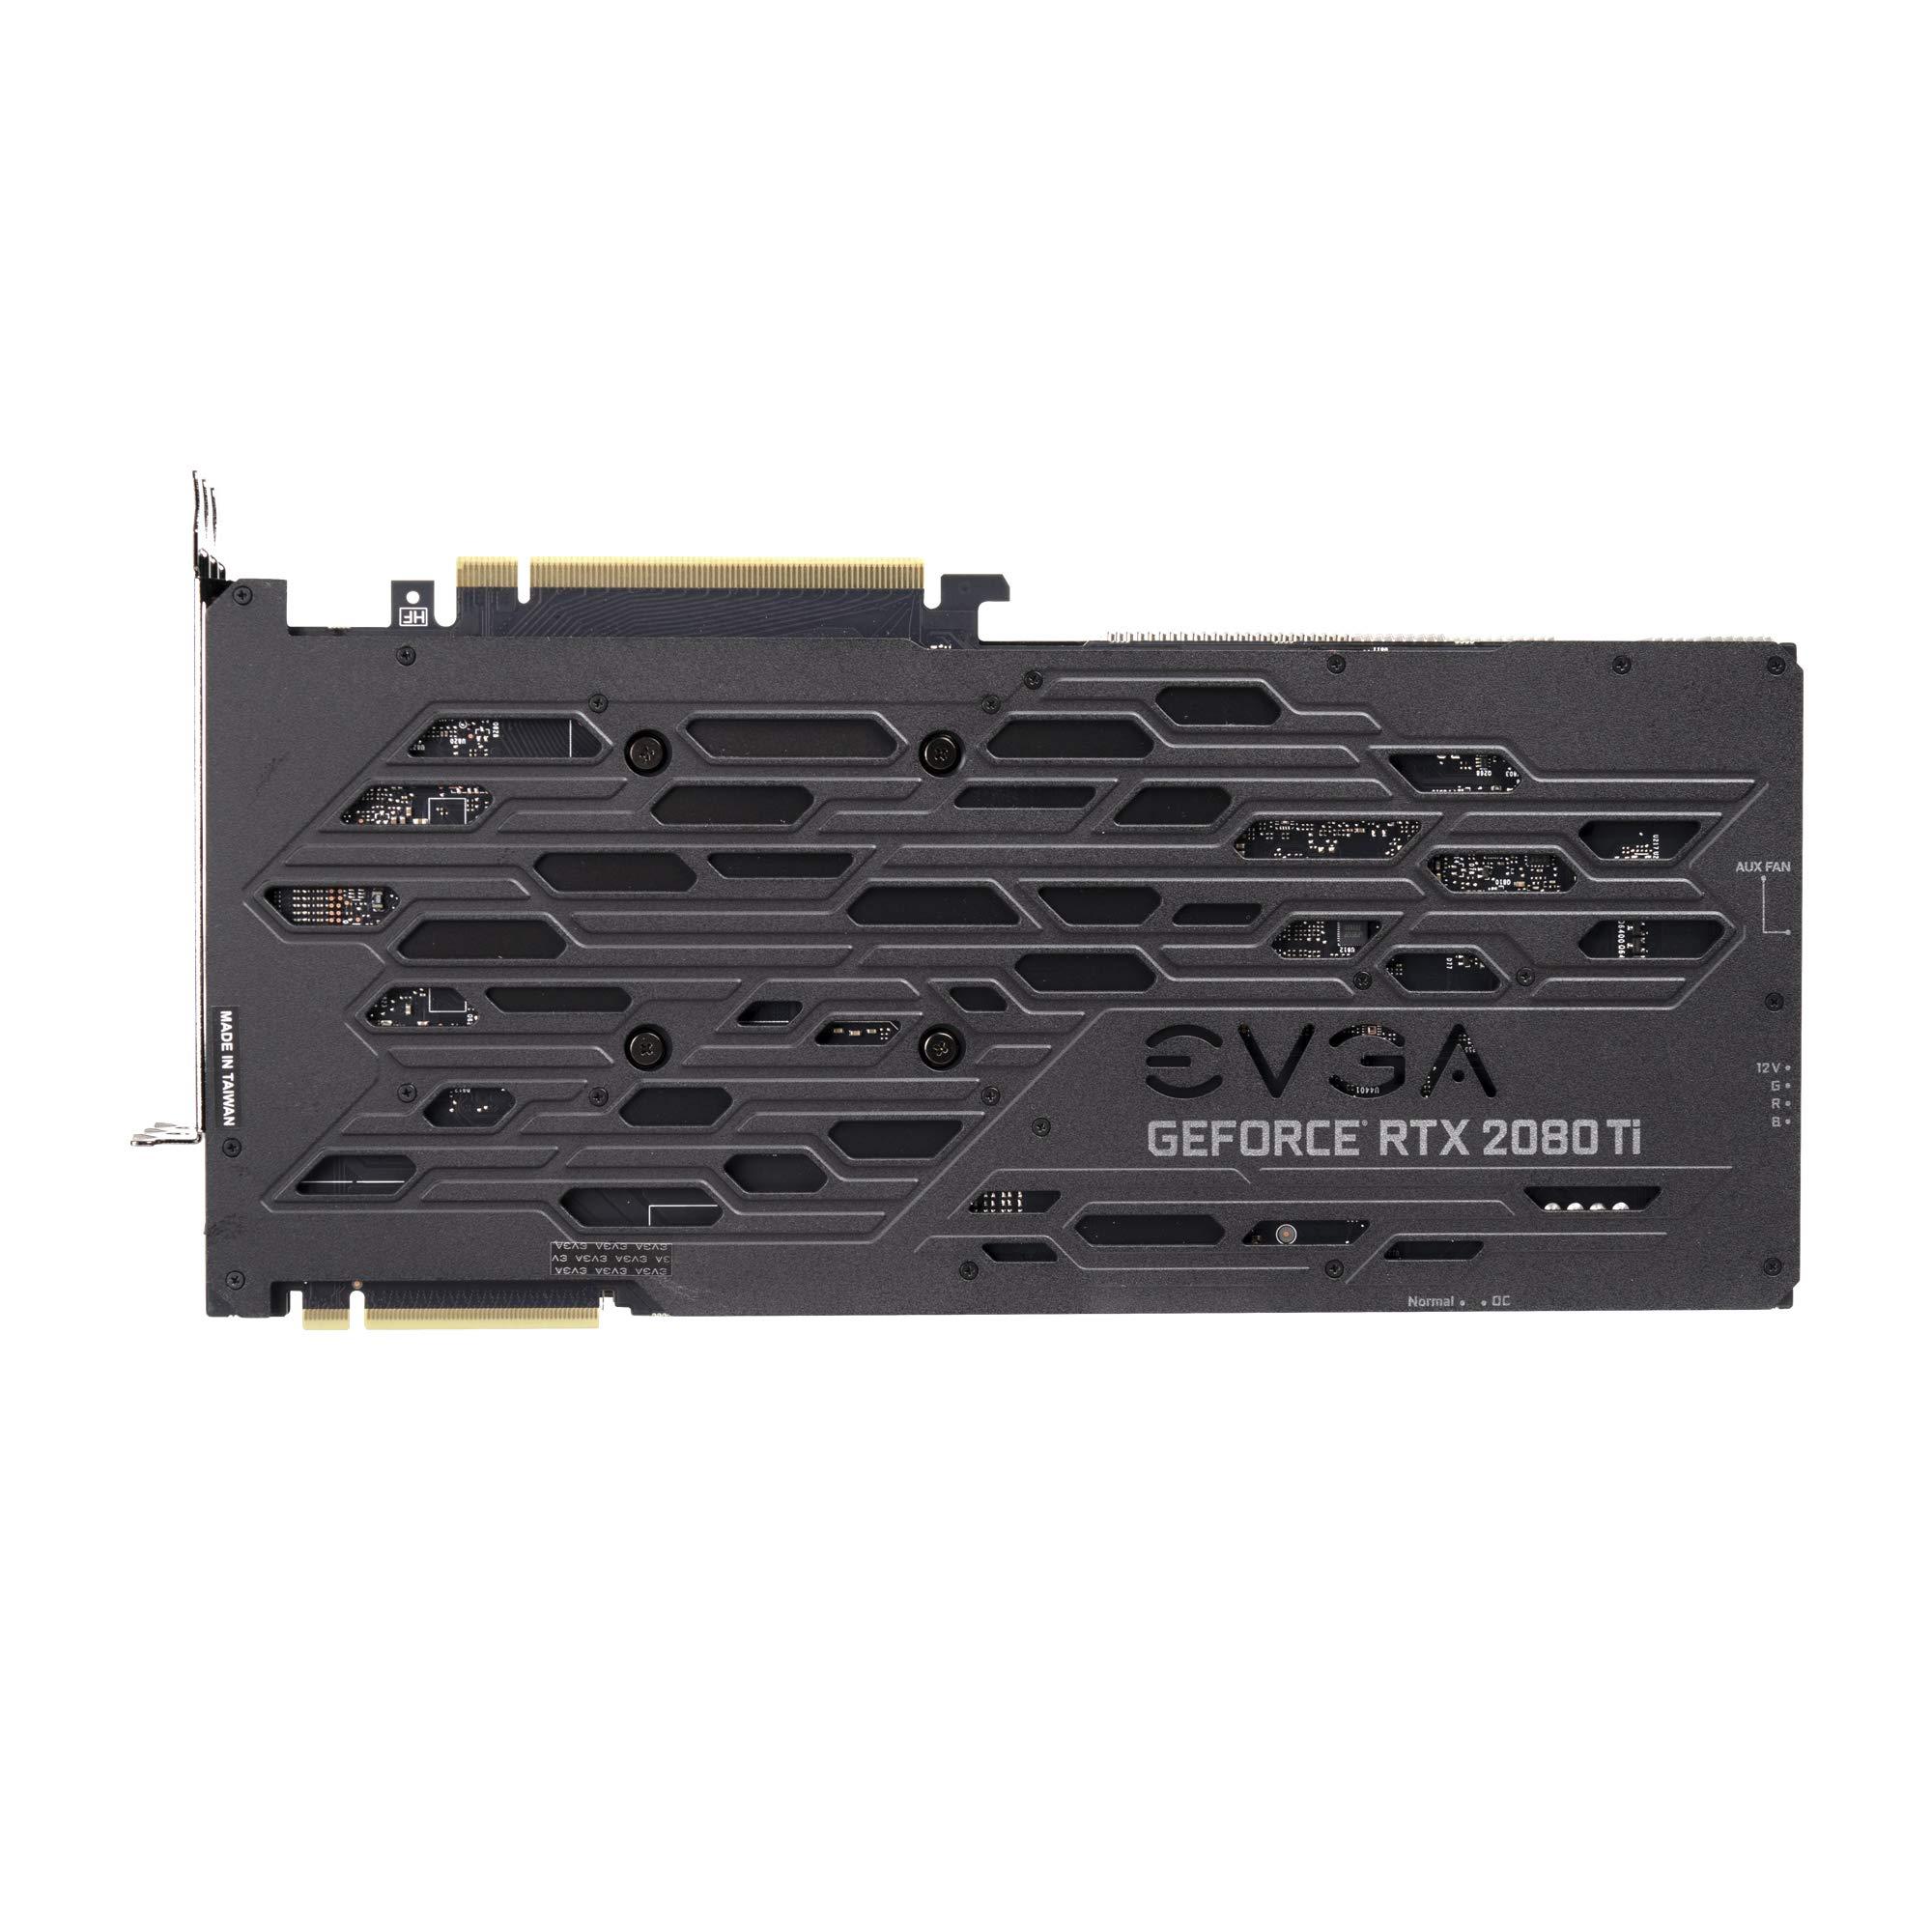 EVGA GeForce RTX 2080 Ti FTW3 Ultra Gaming, 11GB GDDR6, iCX2 & RGB LED Graphics Card 11G-P4-2487-KR by EVGA (Image #7)